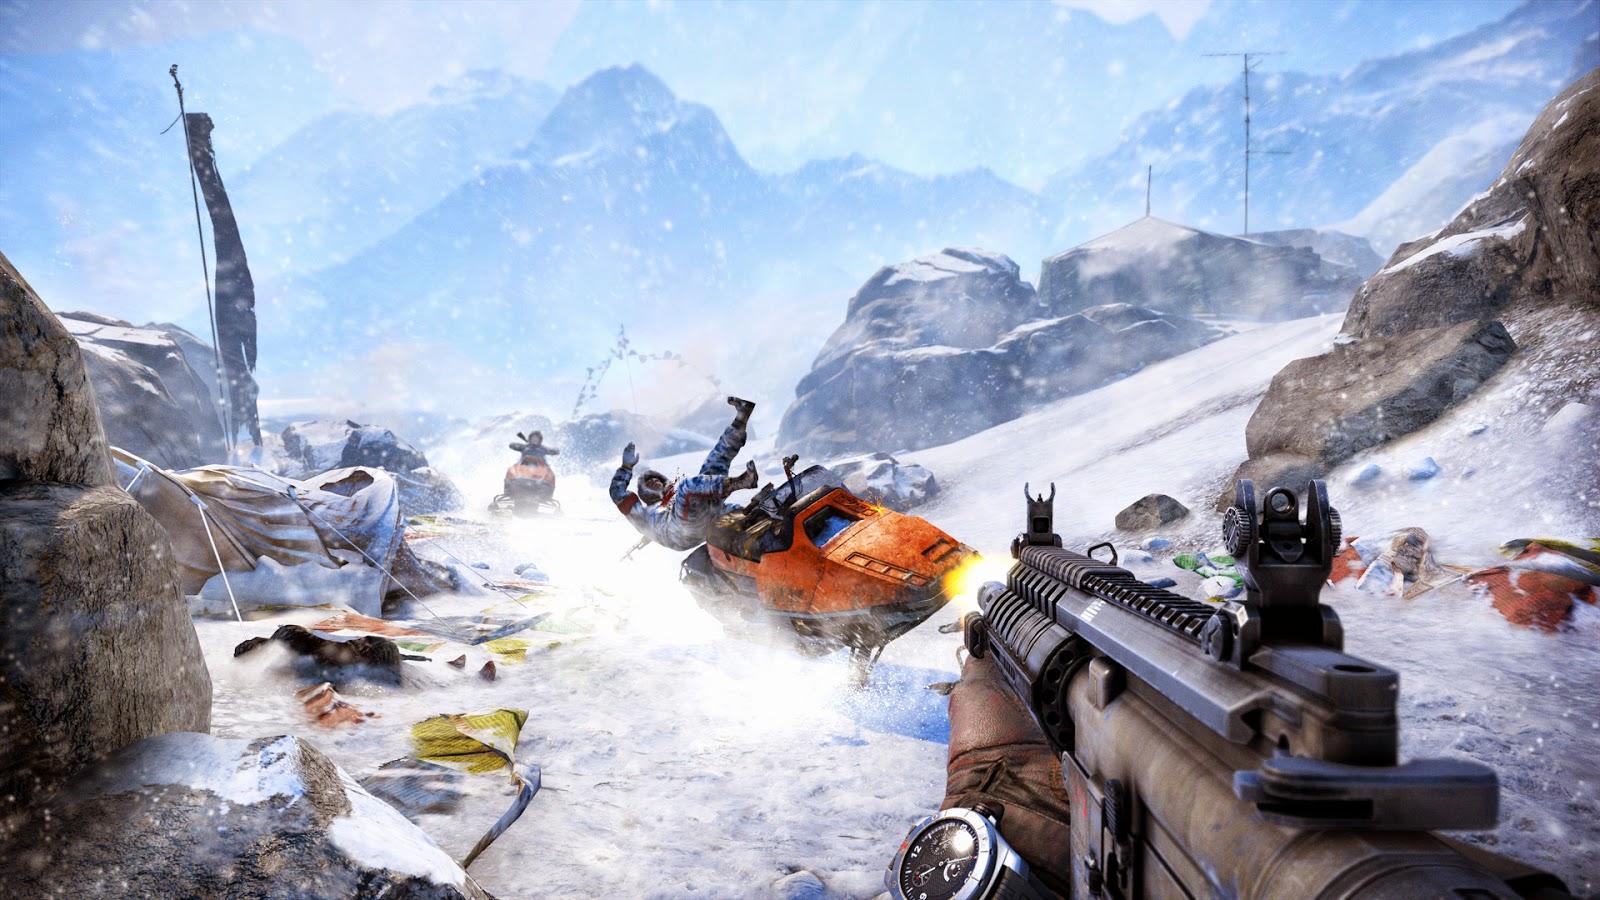 Far Cry 4-SKIDROW Full Game Fc4_screen_himalayas_snowmobile_gc_140813_10amcet_1407889598-jpg